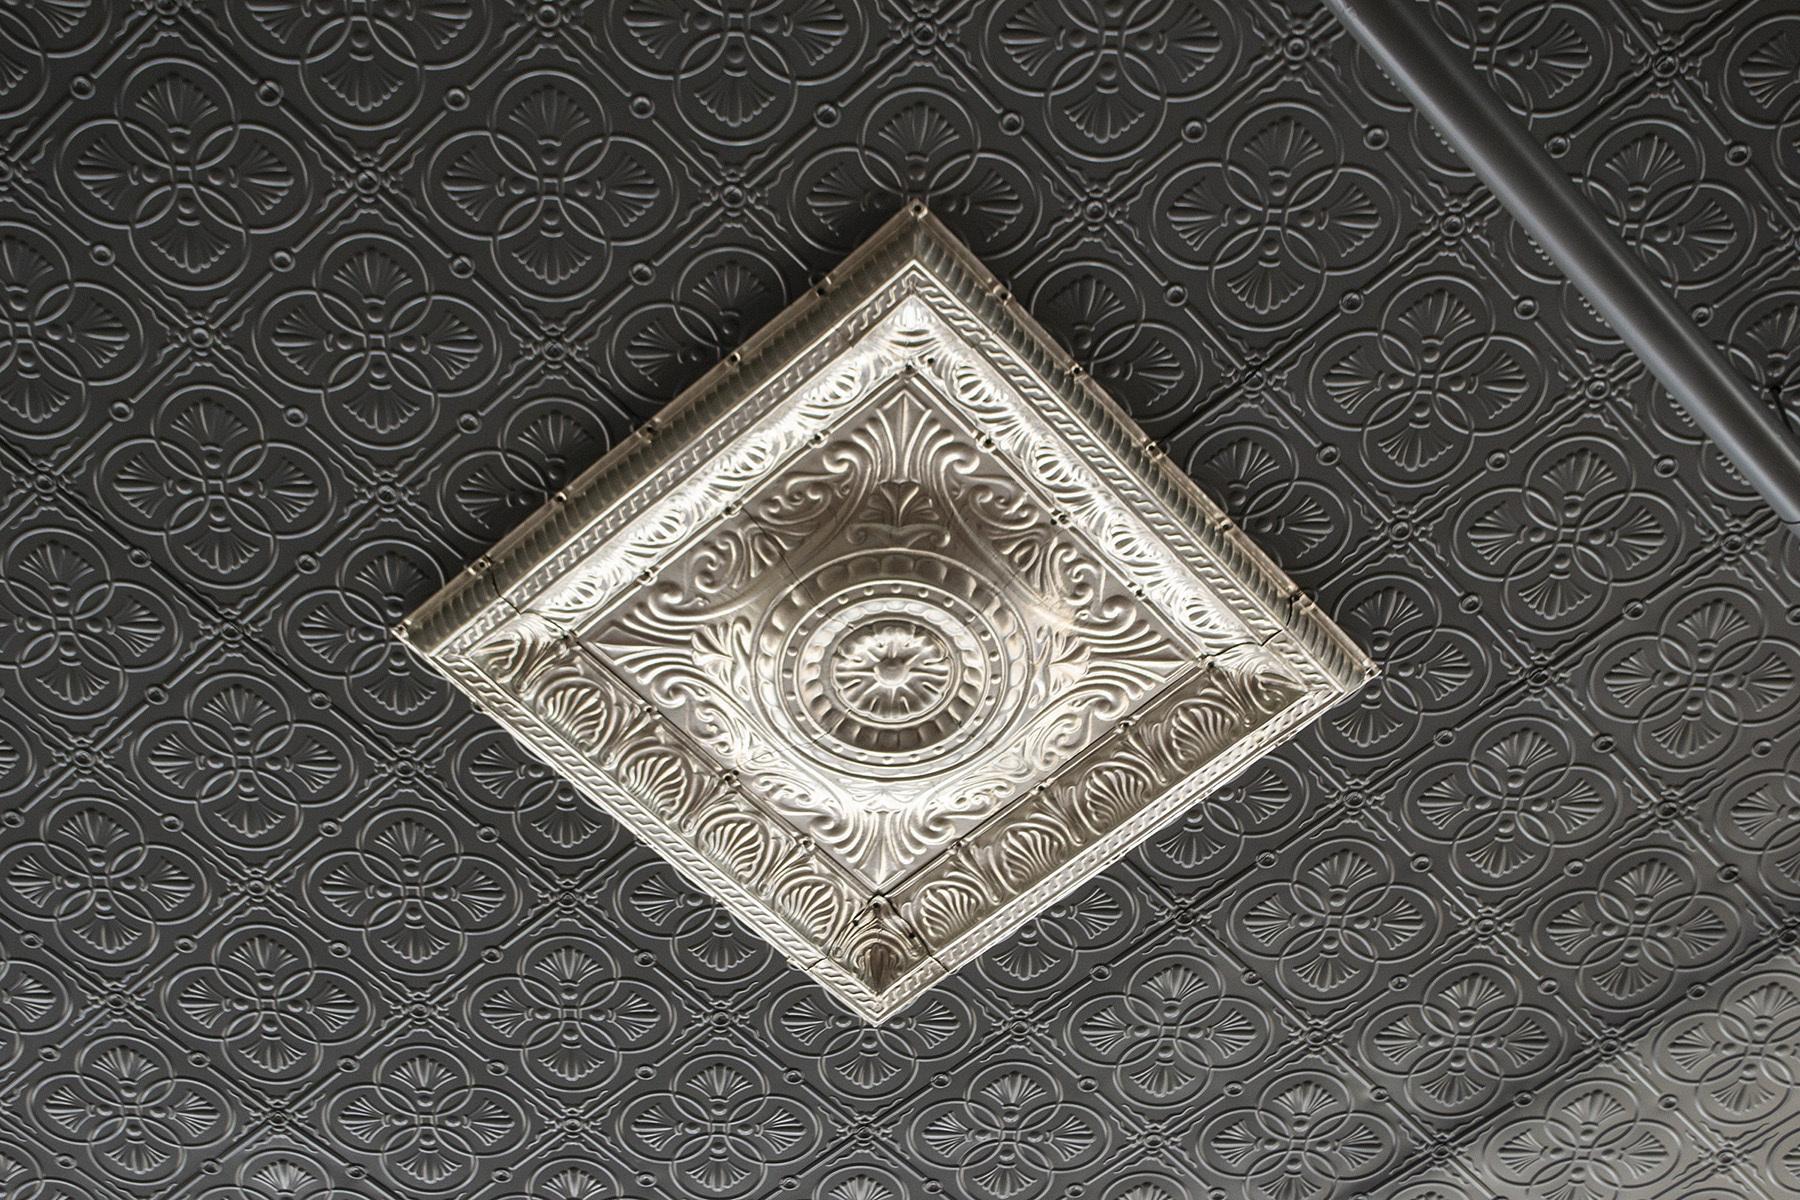 Ceiling Tile Detail 2